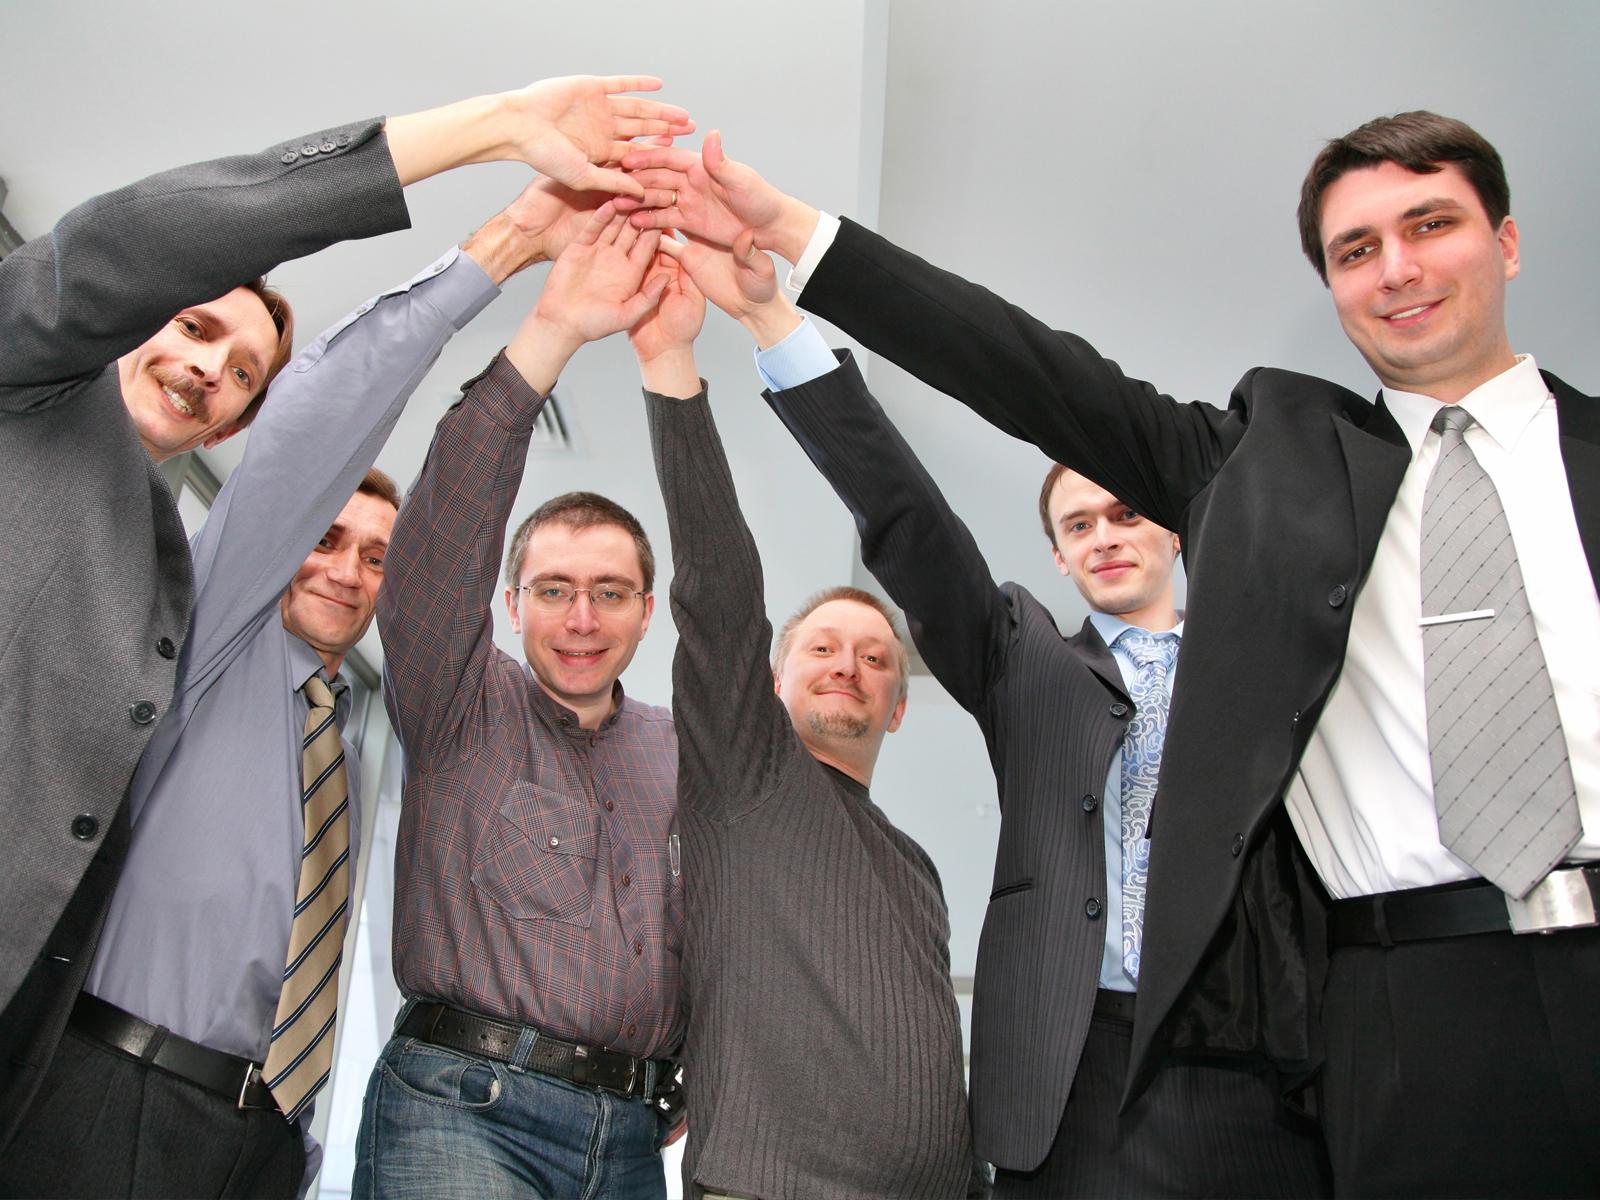 A espiritualidade pode ajudar na produtividade das empresas